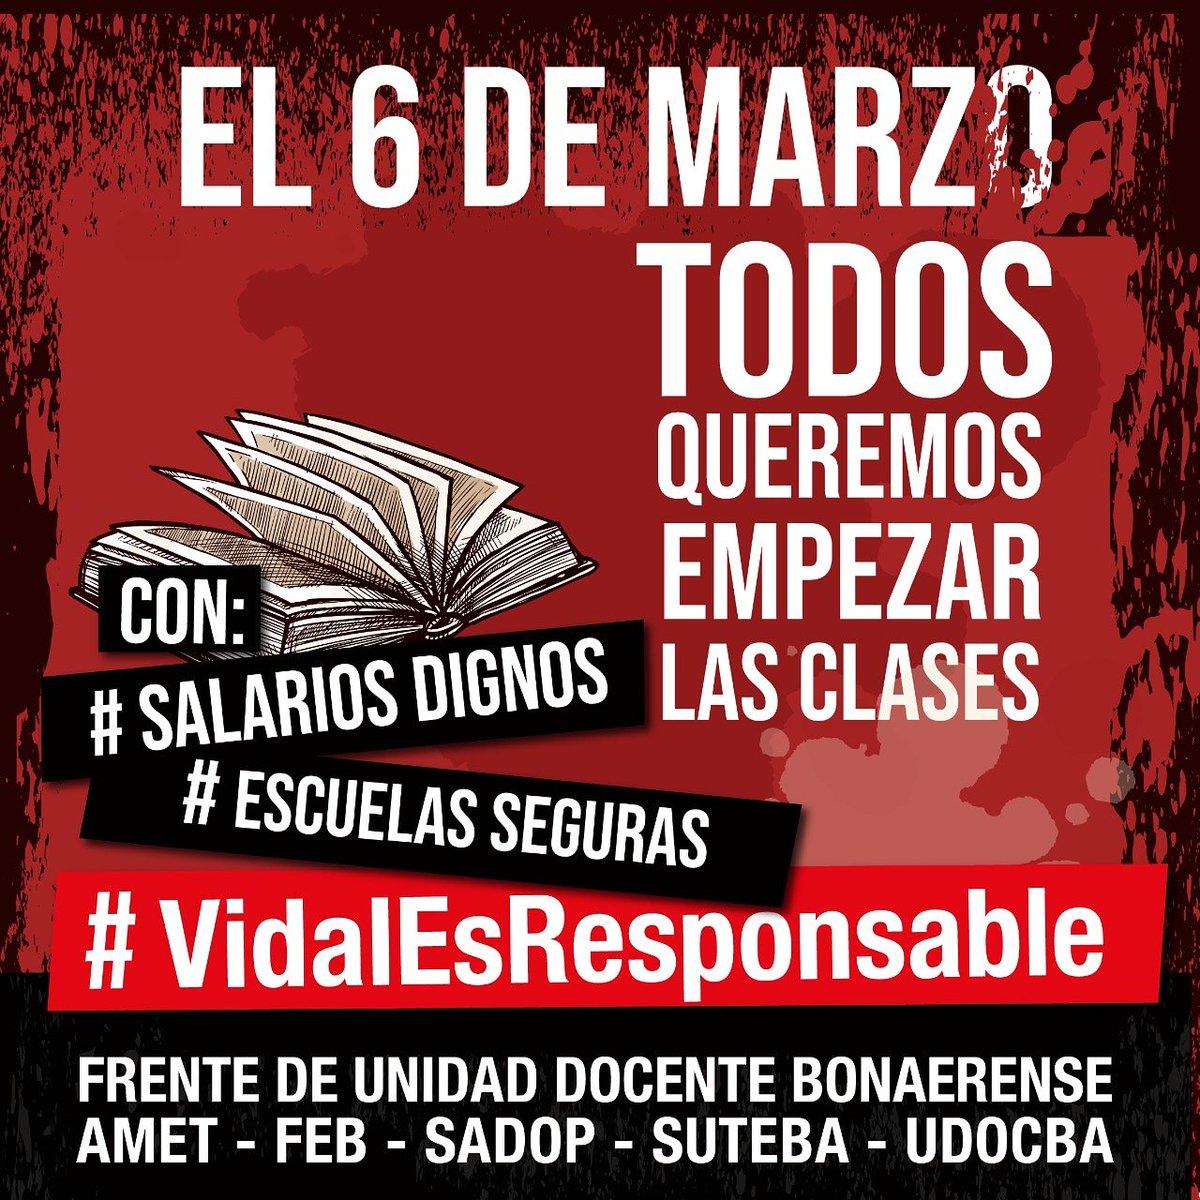 Gustavo F. SALCEDO's photo on #VidalEsResponsable